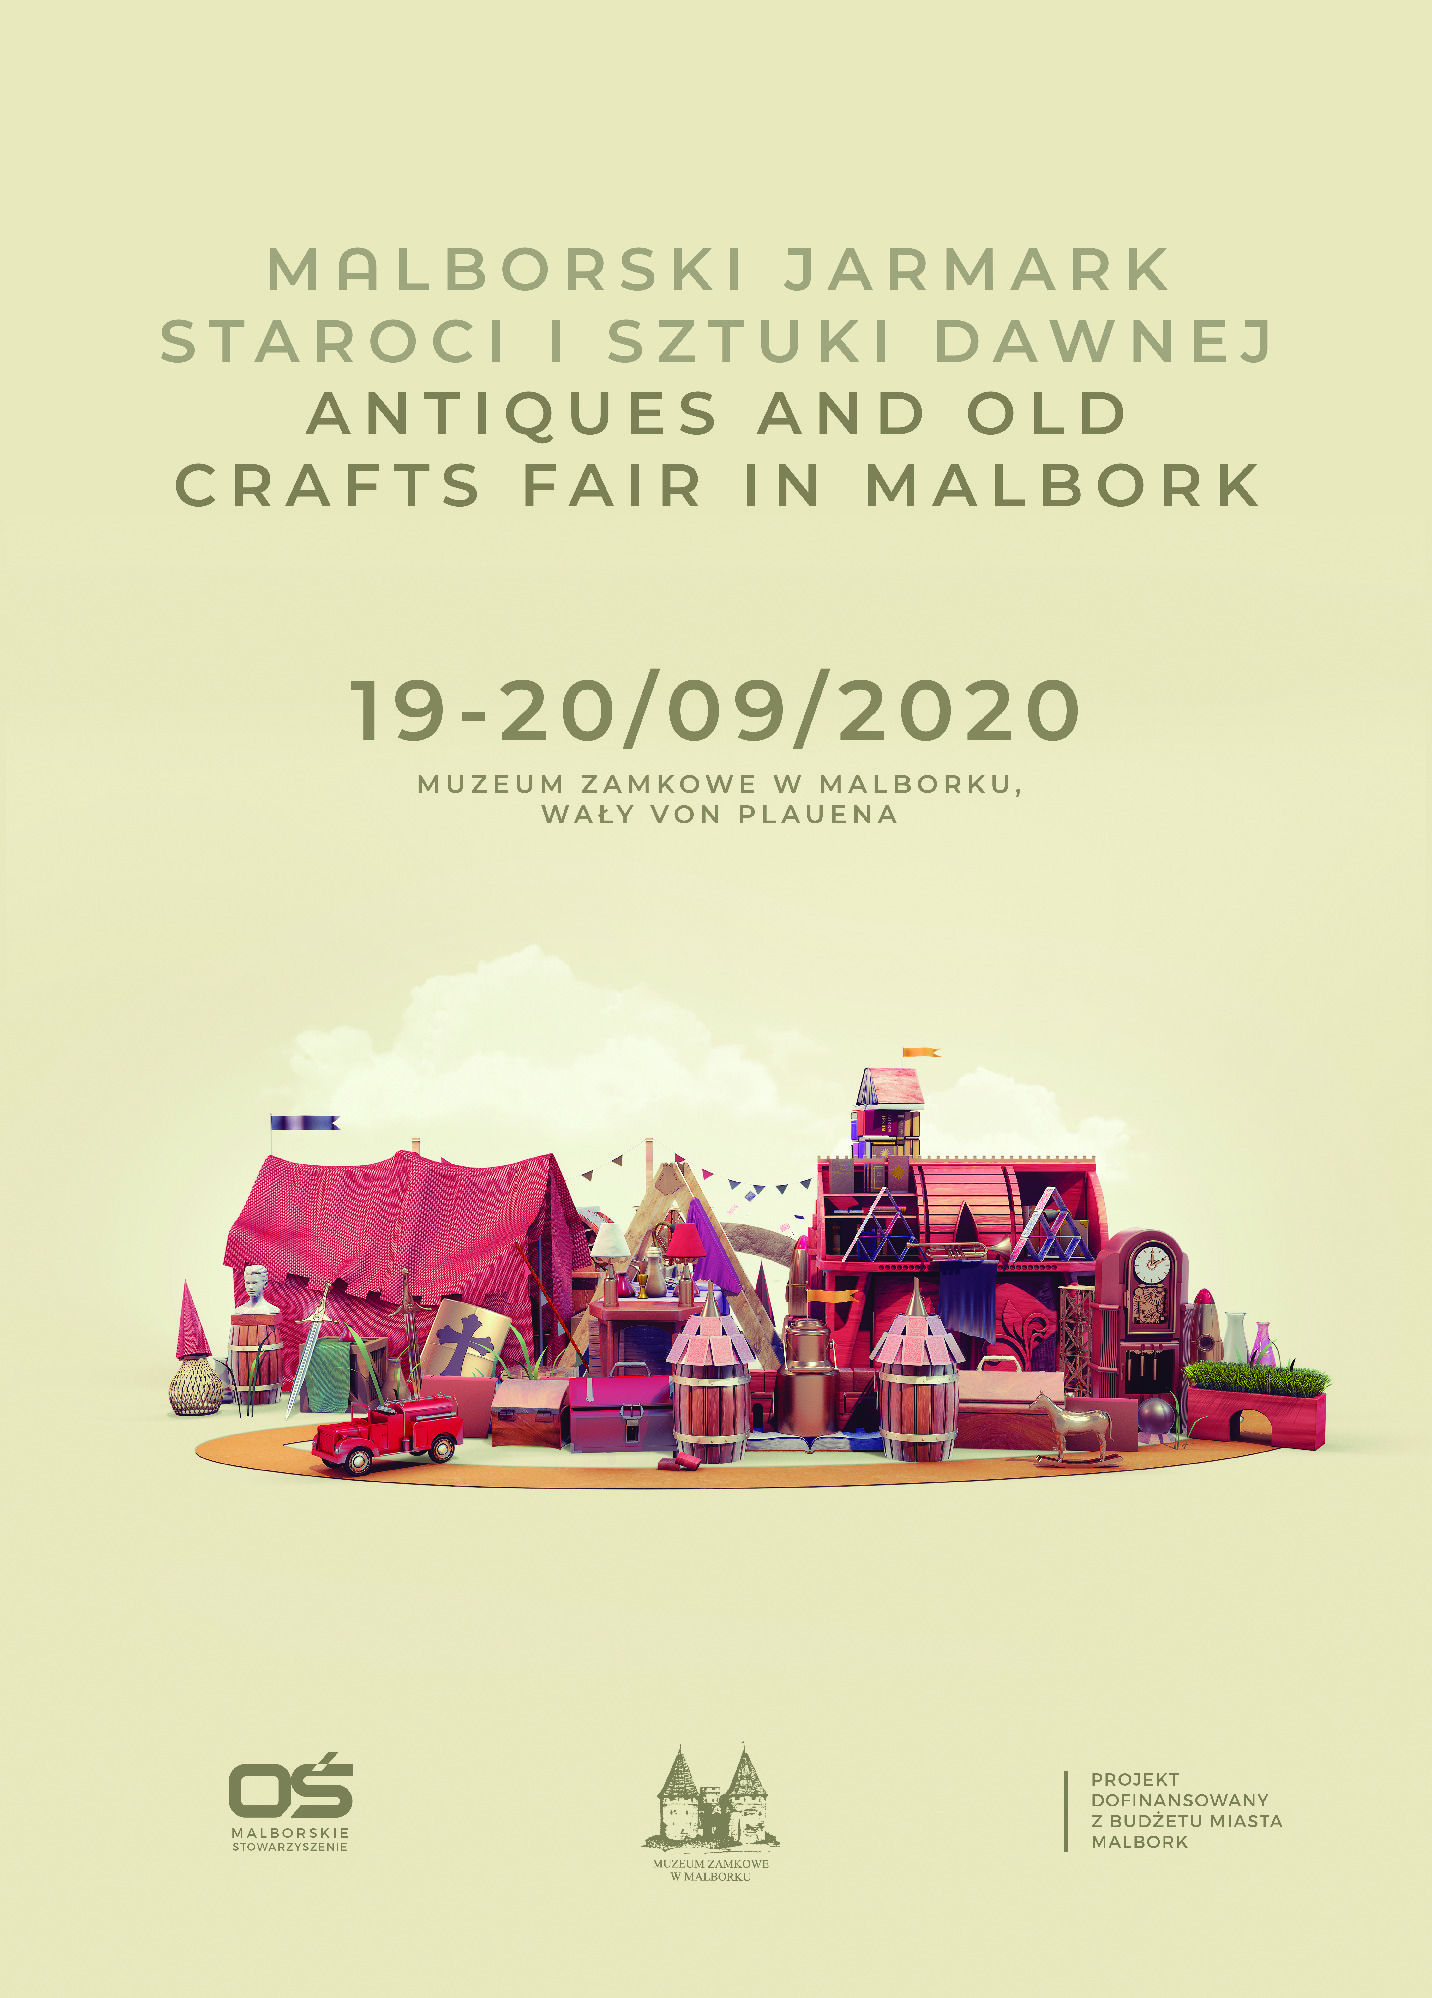 http://m.82-200.pl/2020/08/orig/jarmark-2020-plakat-druk-70x50-6378.jpg